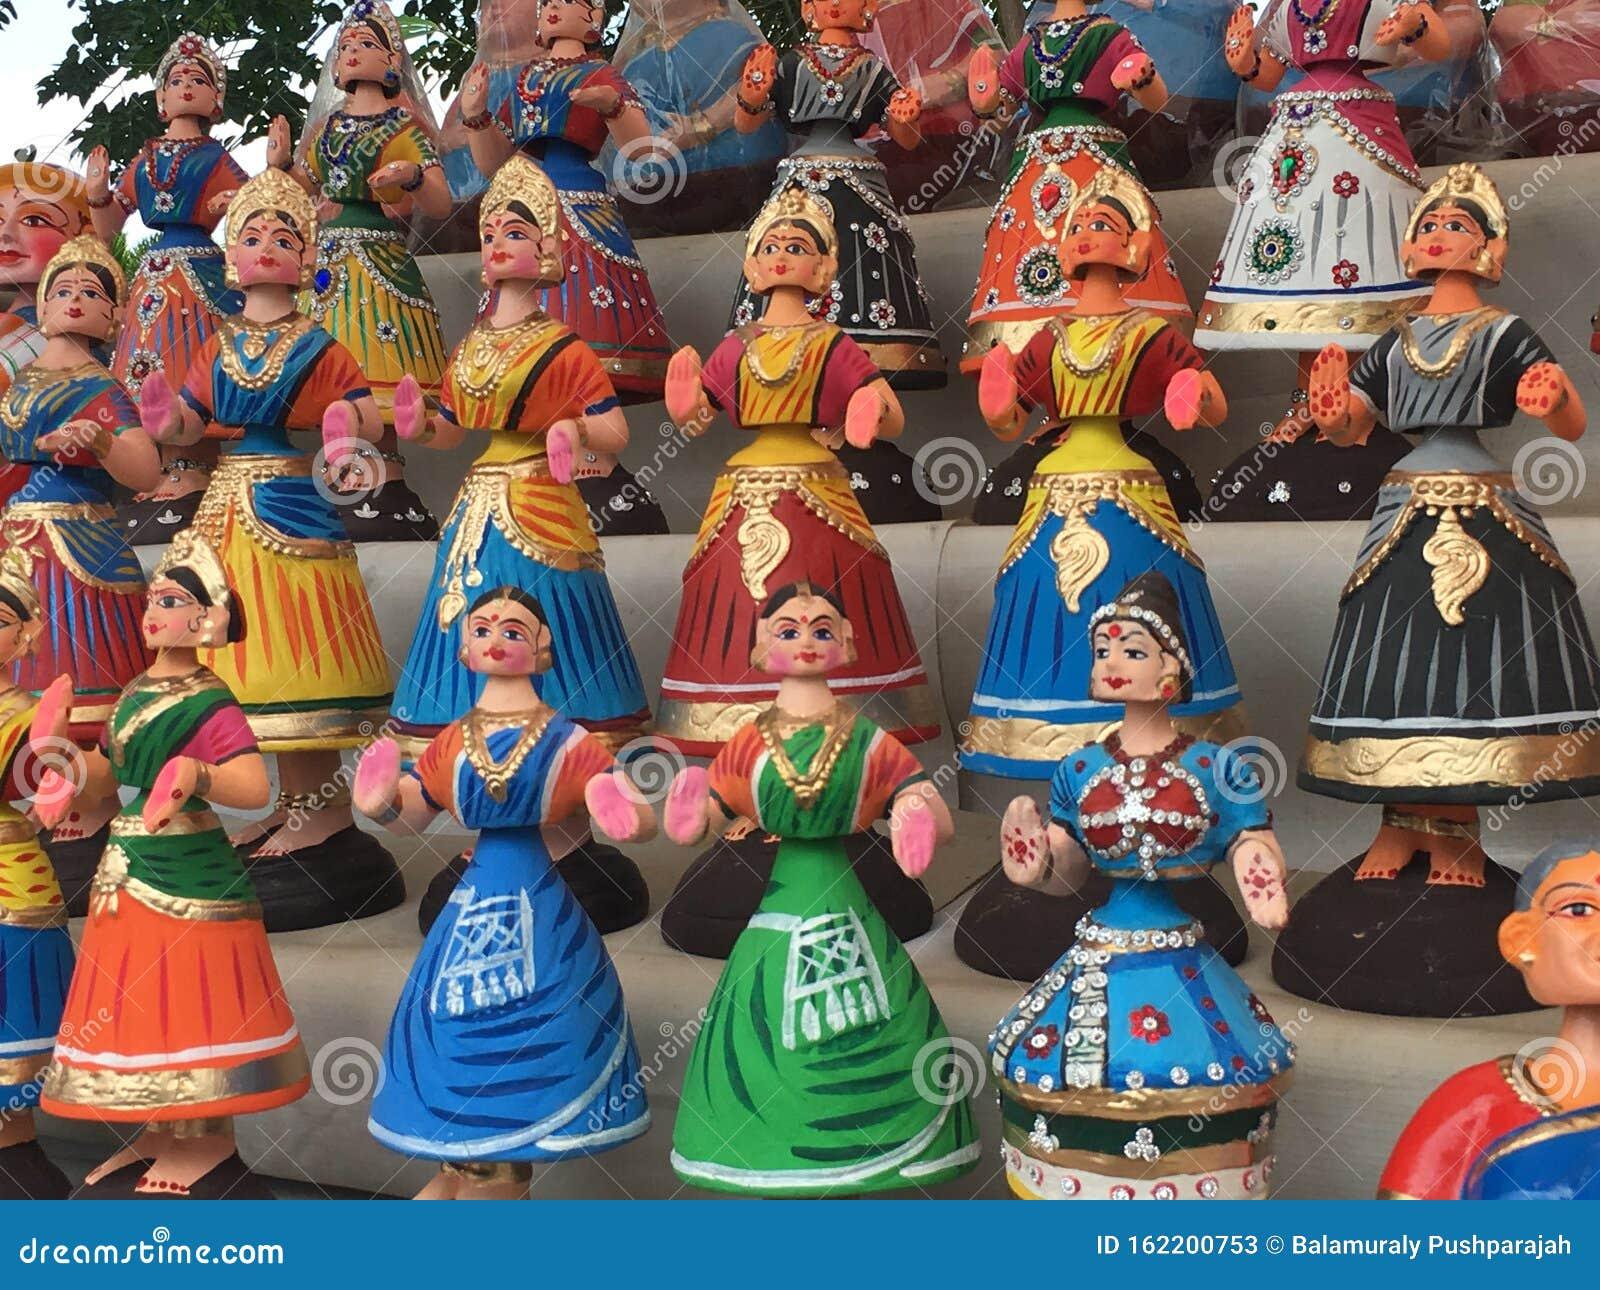 Thanjavur dolls stock image. Image of colourful, dolls - 162200753